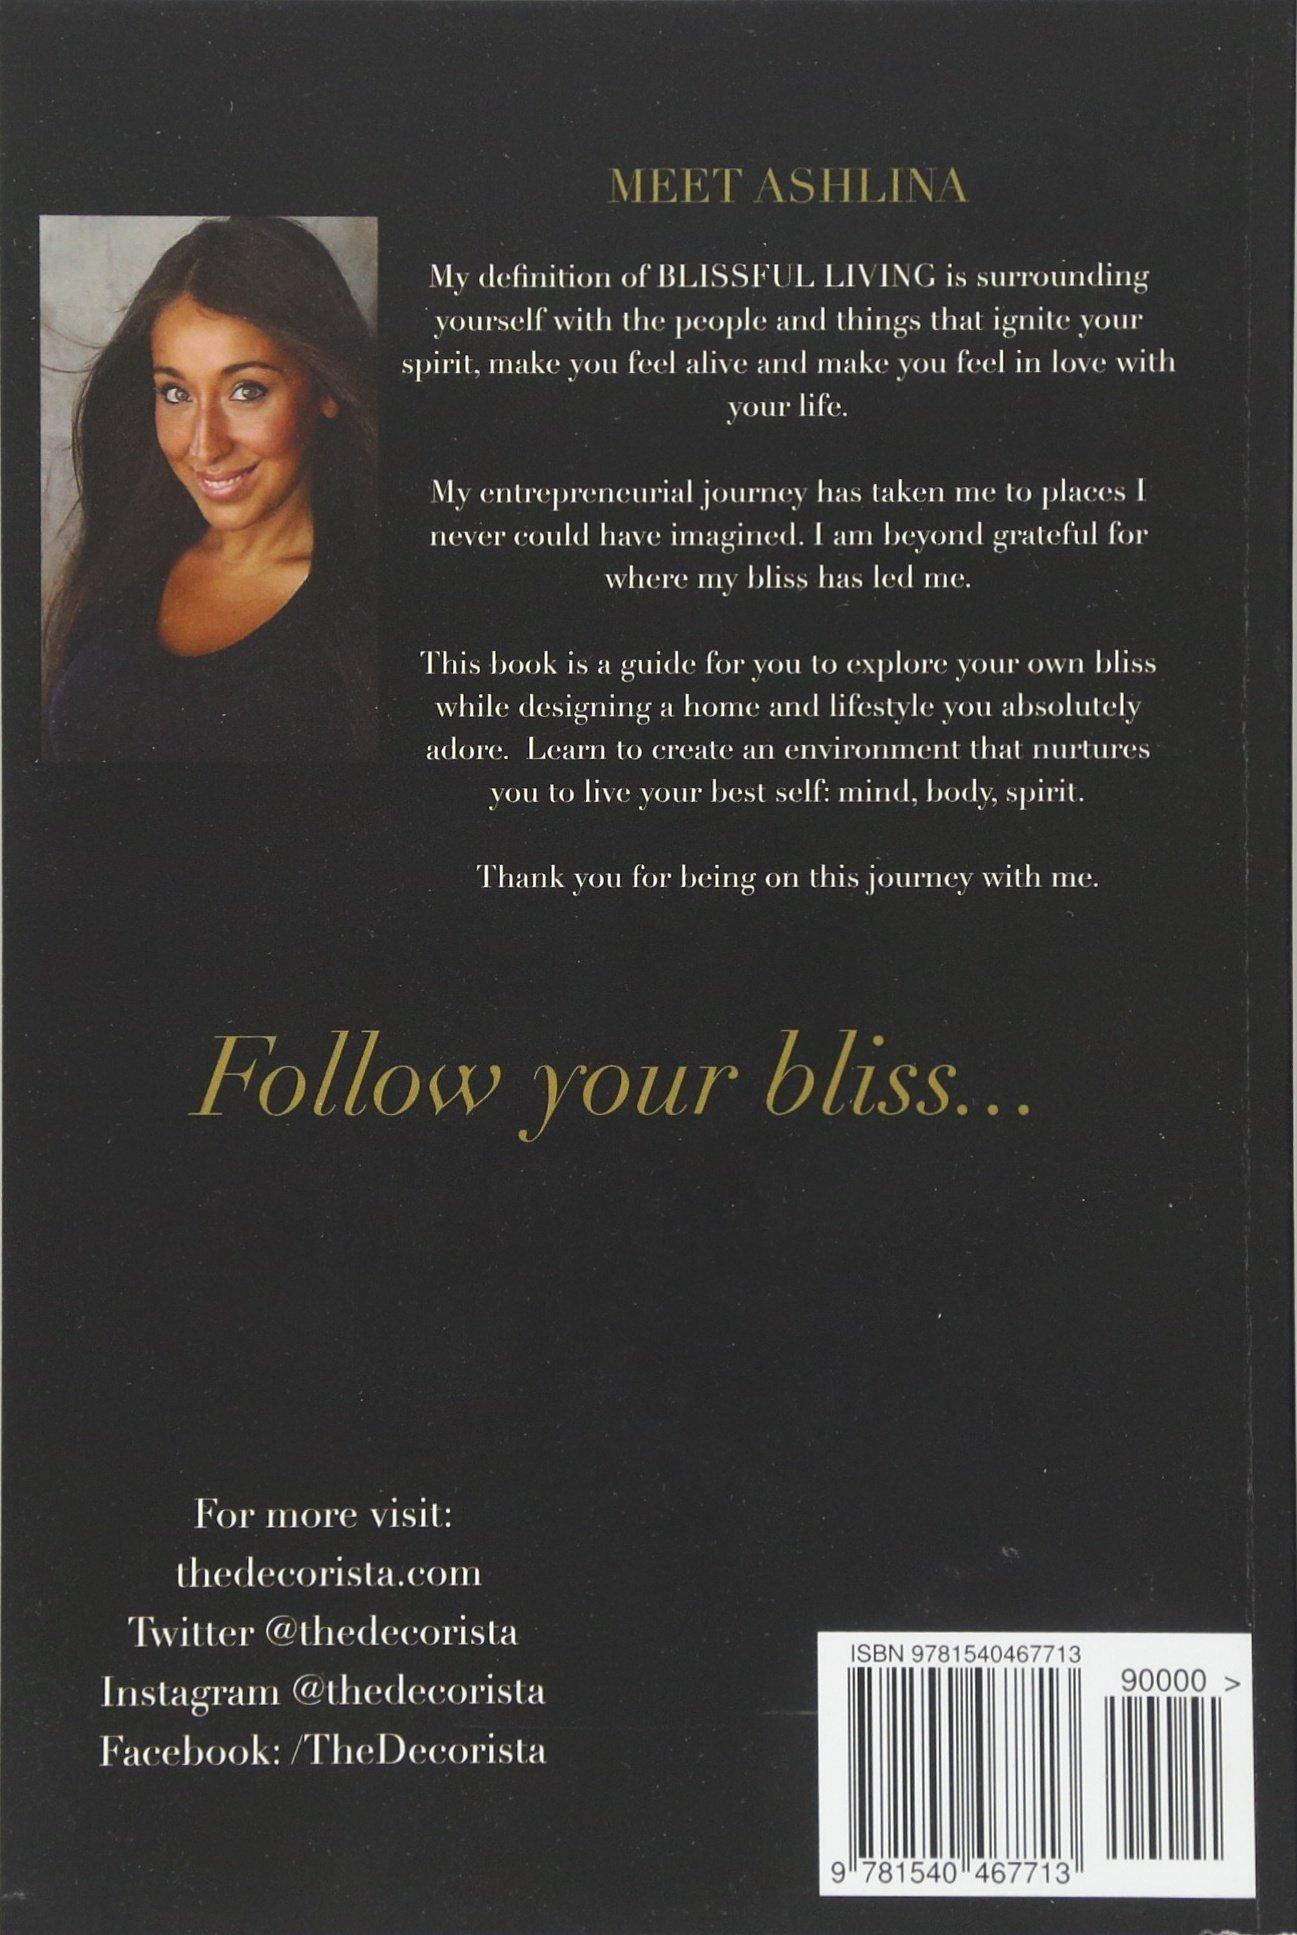 Superbe Blissful Living: Designing A Home And Life You Love: Ashlina Kaposta:  9781540467713: Amazon.com: Books